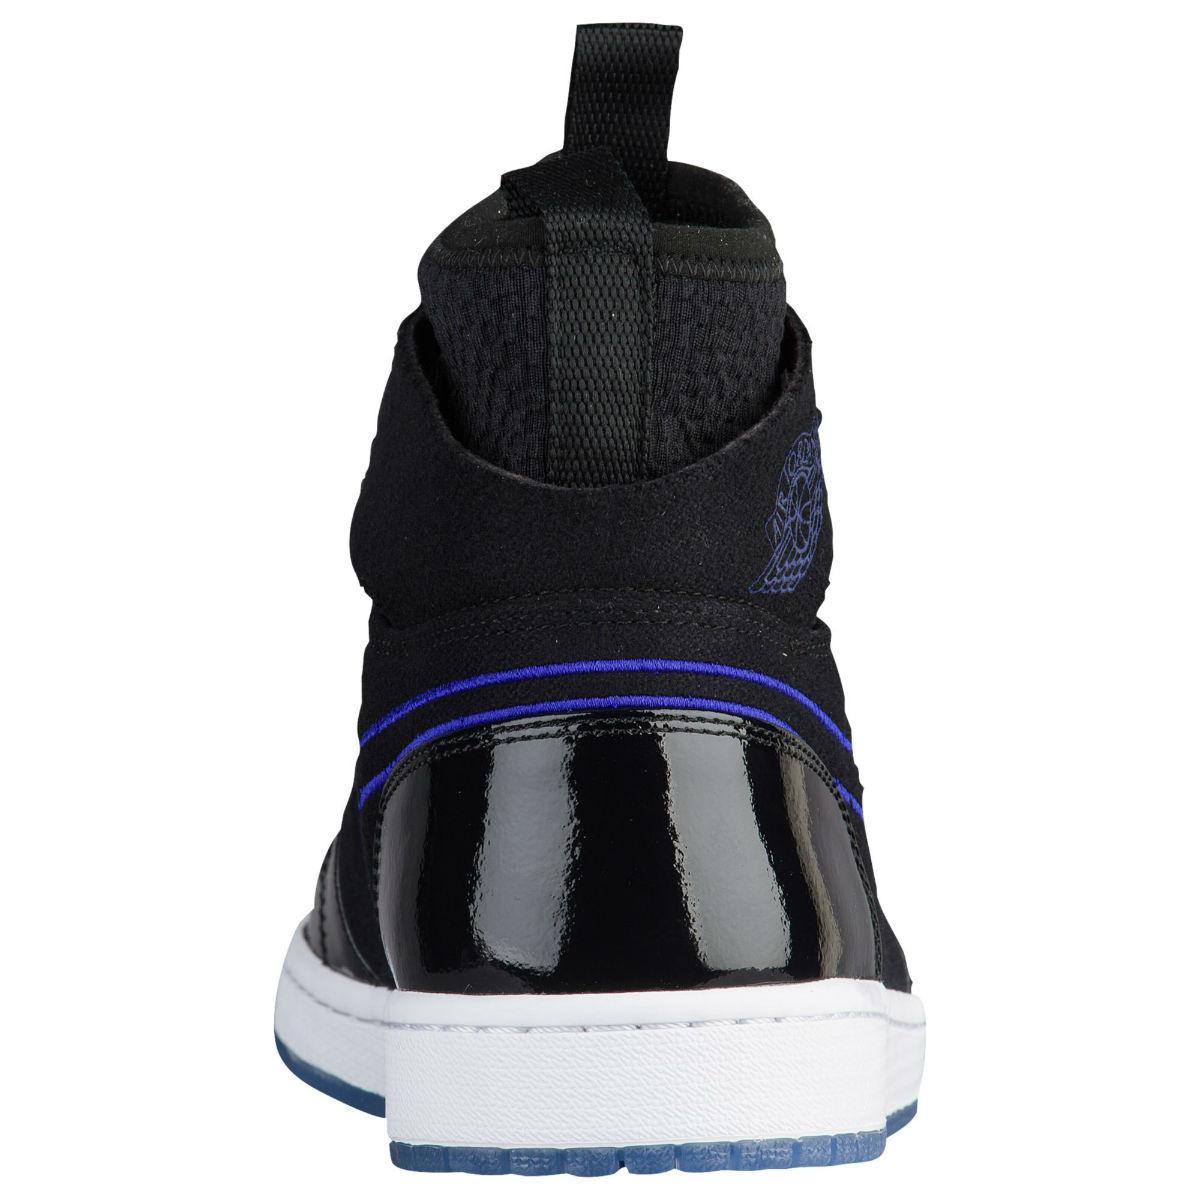 8882732aa90 Air Jordan 1 Ultra High Space Jam Release Date 844700-002   Sole ...